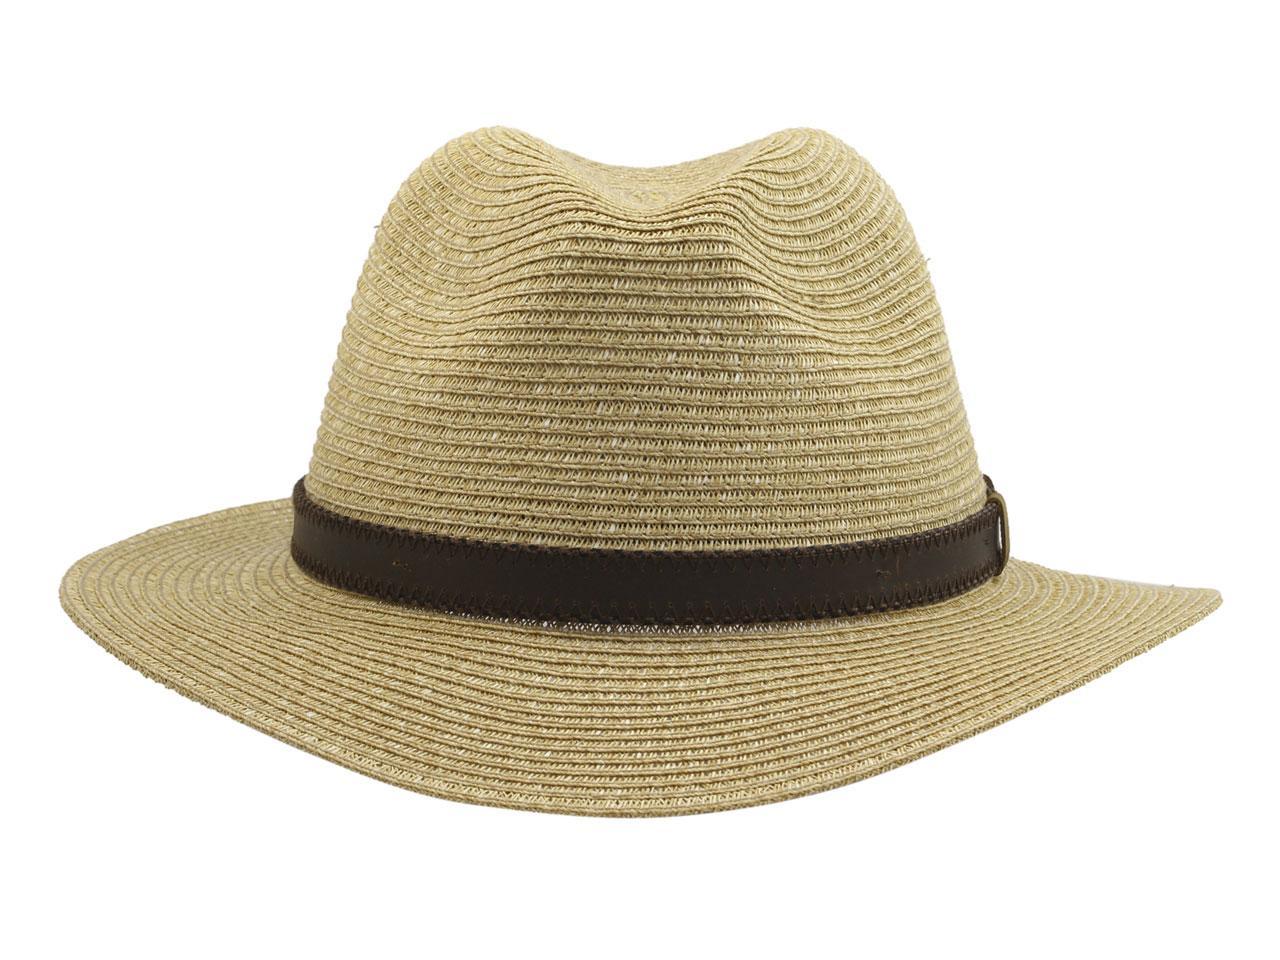 697785d7a31 Tommy Bahama Men s Fine Braid Toyo Safari Hat by Tommy Bahama